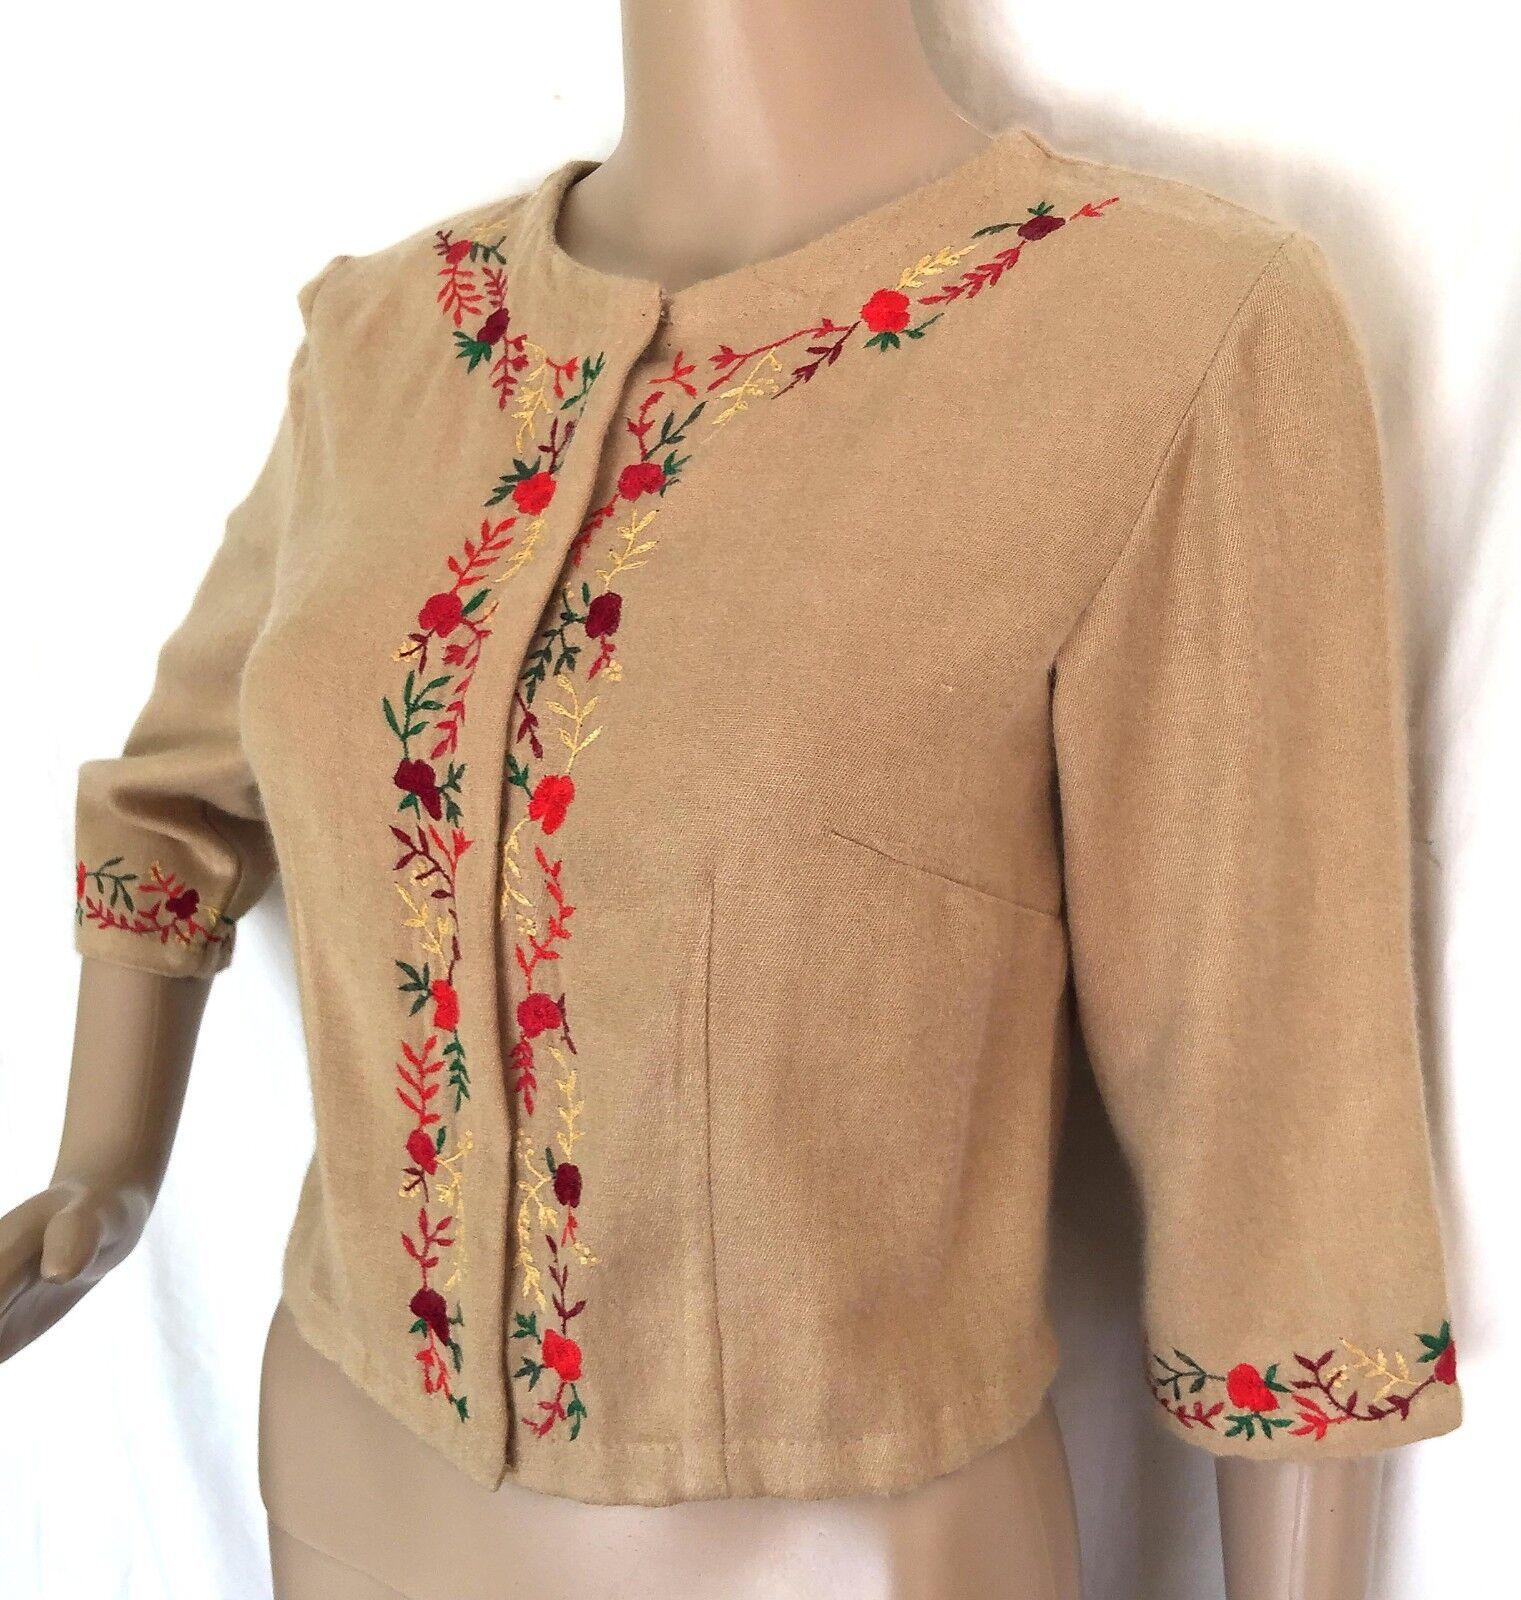 Anopia Collezioni Beige Embroidered Cashmere Silk Blend Cardigan - Size 4- NWT